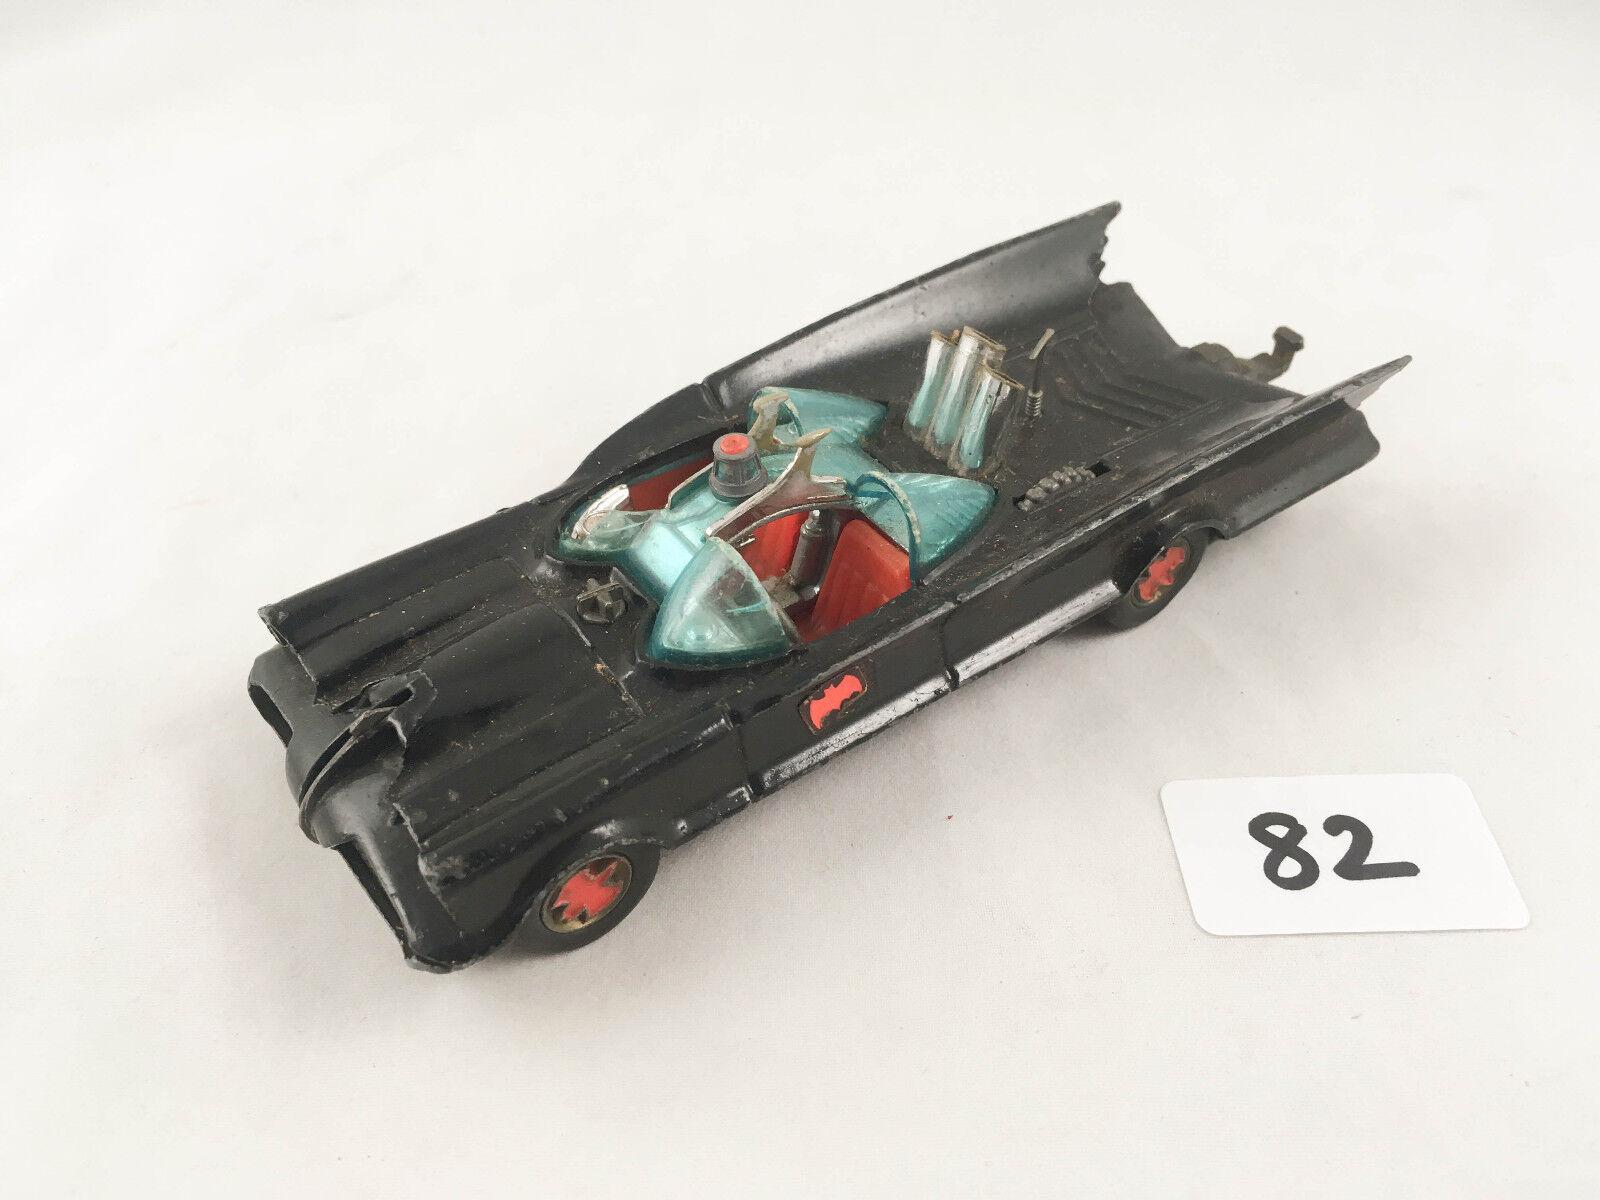 Super - seltenen 2. ausgabe vintage corgi spielzeug   267 batmobil 1966 batman druckguss - auto